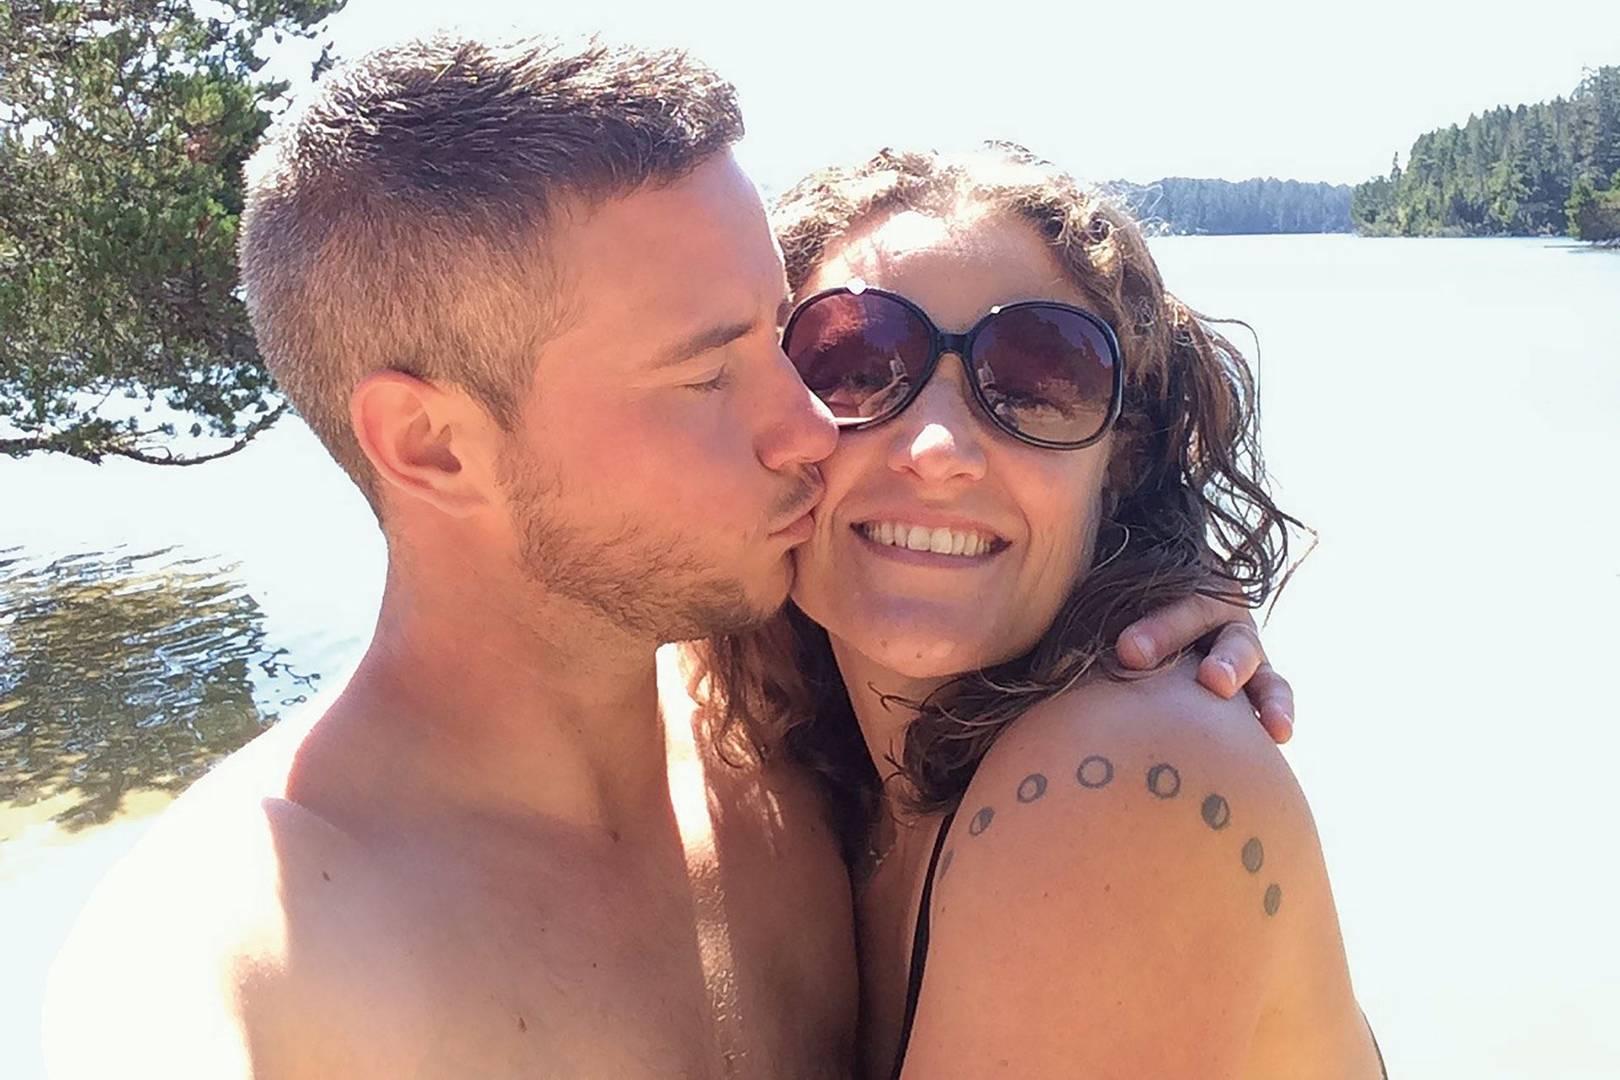 Transman dating straight women kissing